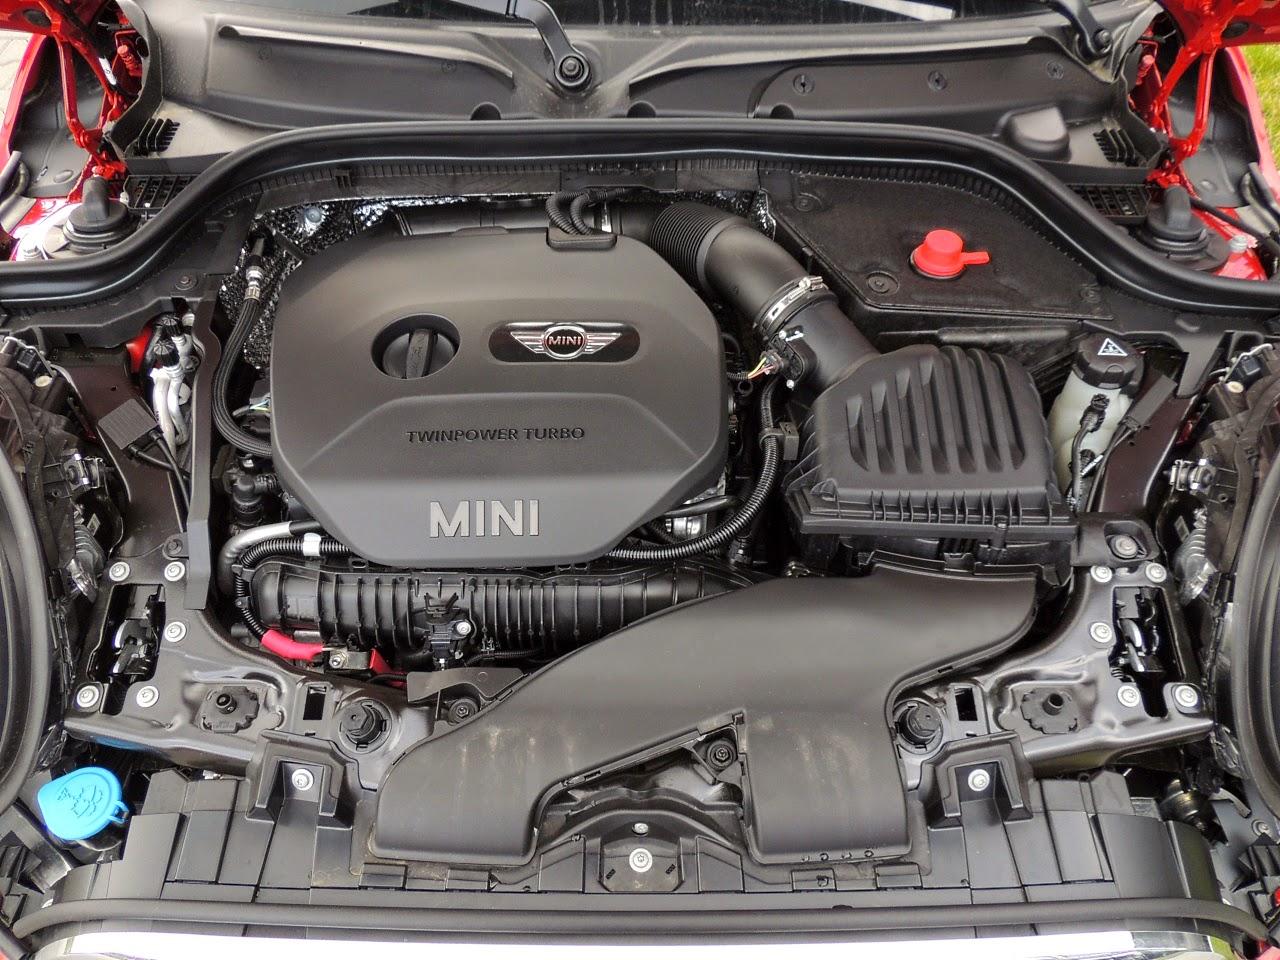 MINI Cooper S - silnik 2.0 Twin Power Turbo